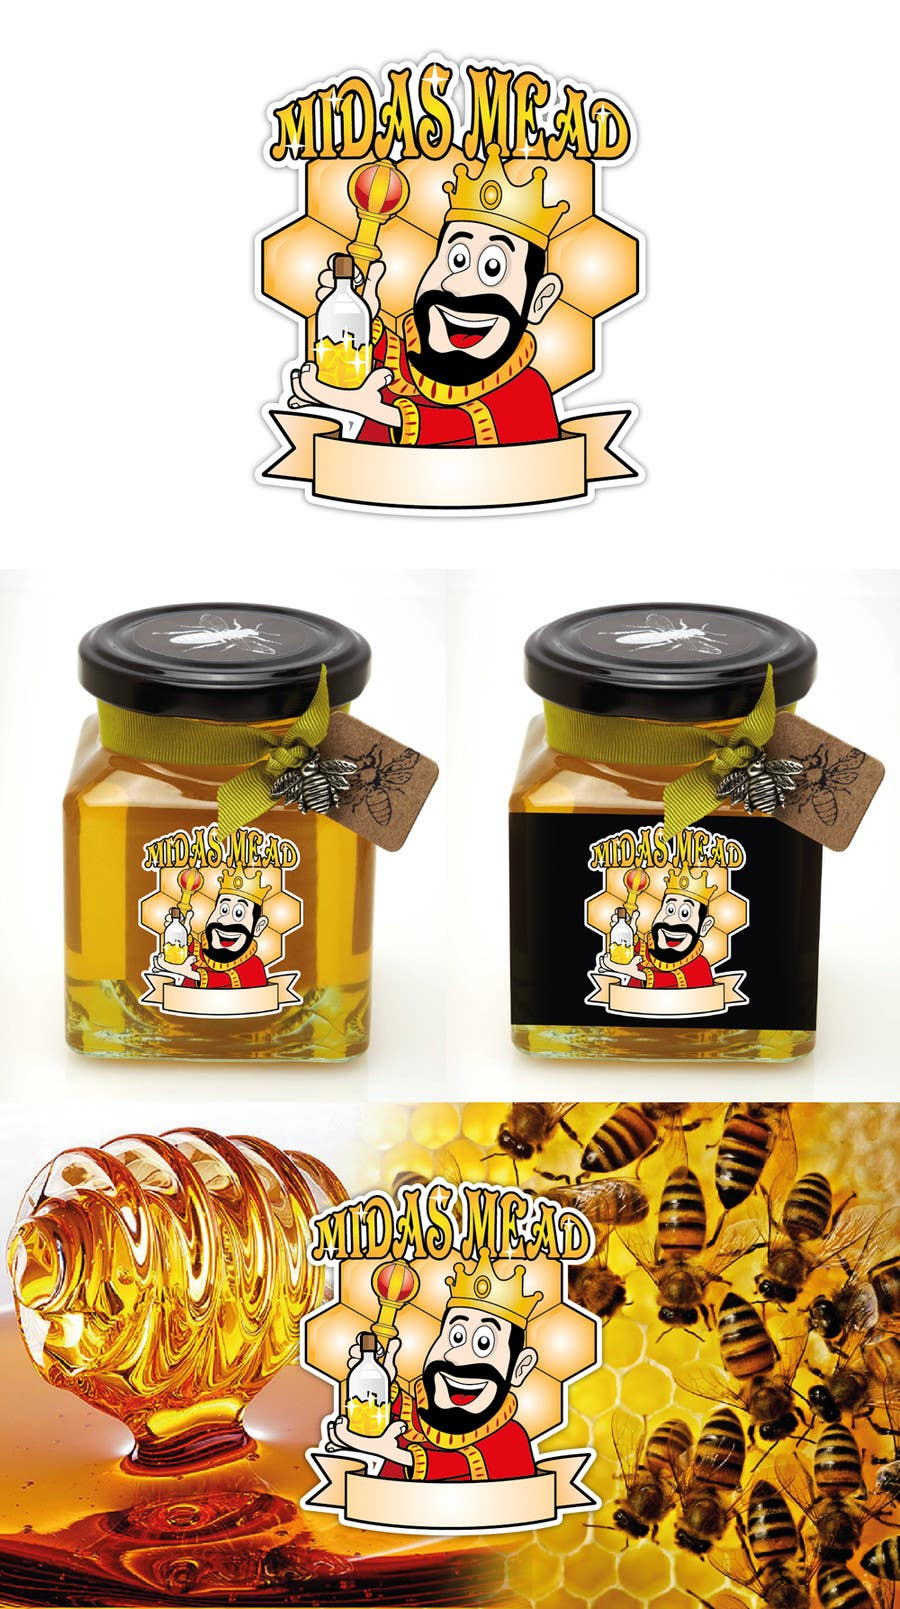 Konkurrenceindlæg #                                        14                                      for                                         Design a Logo for an Alcoholic Honey Drink Company